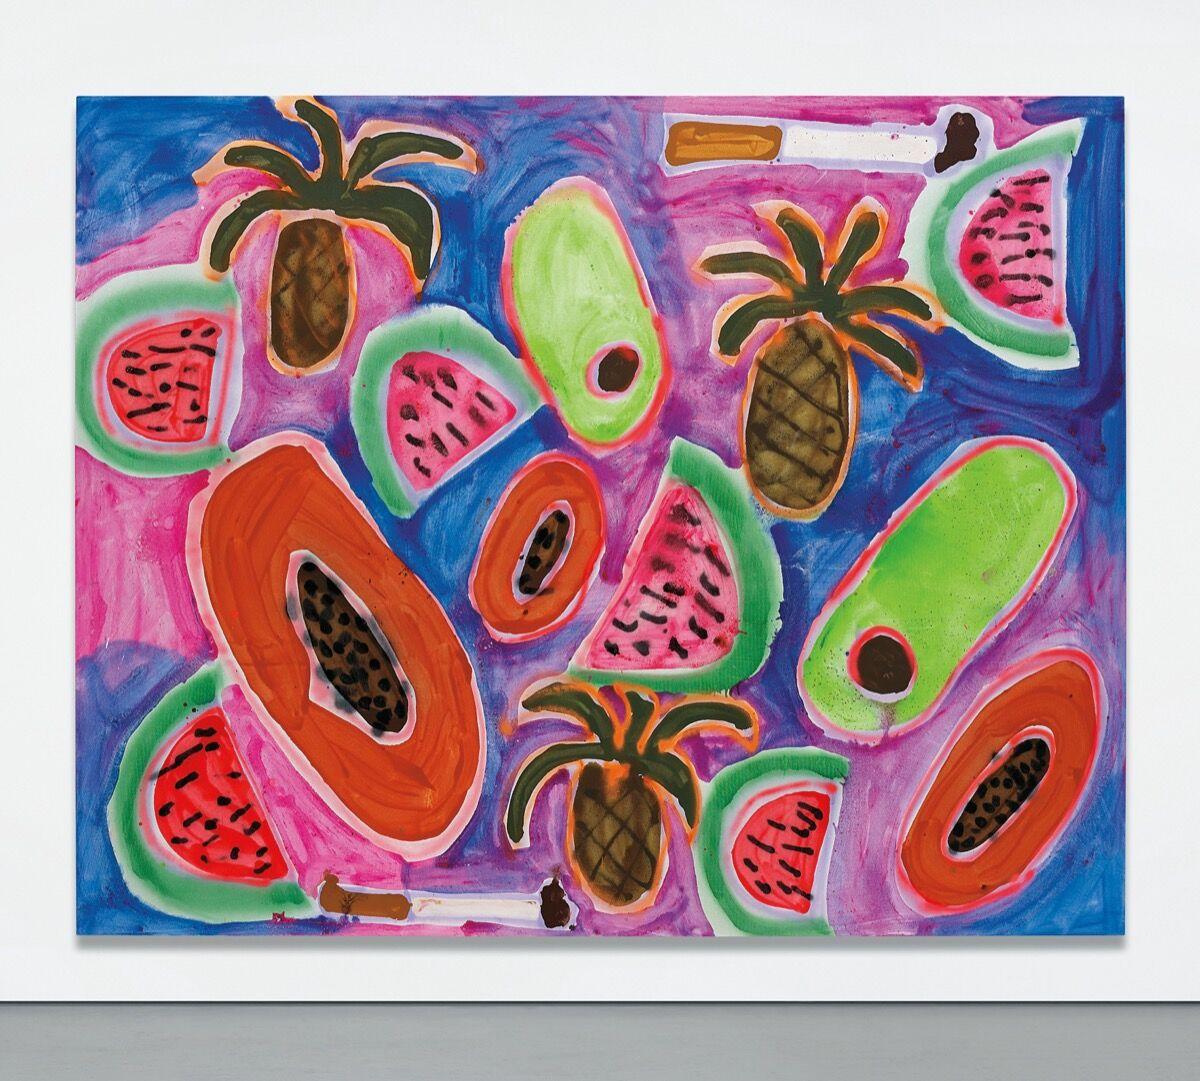 Katherine Bernhardt, Hawaiian Punch, 2014. Courtesy of Phillips.